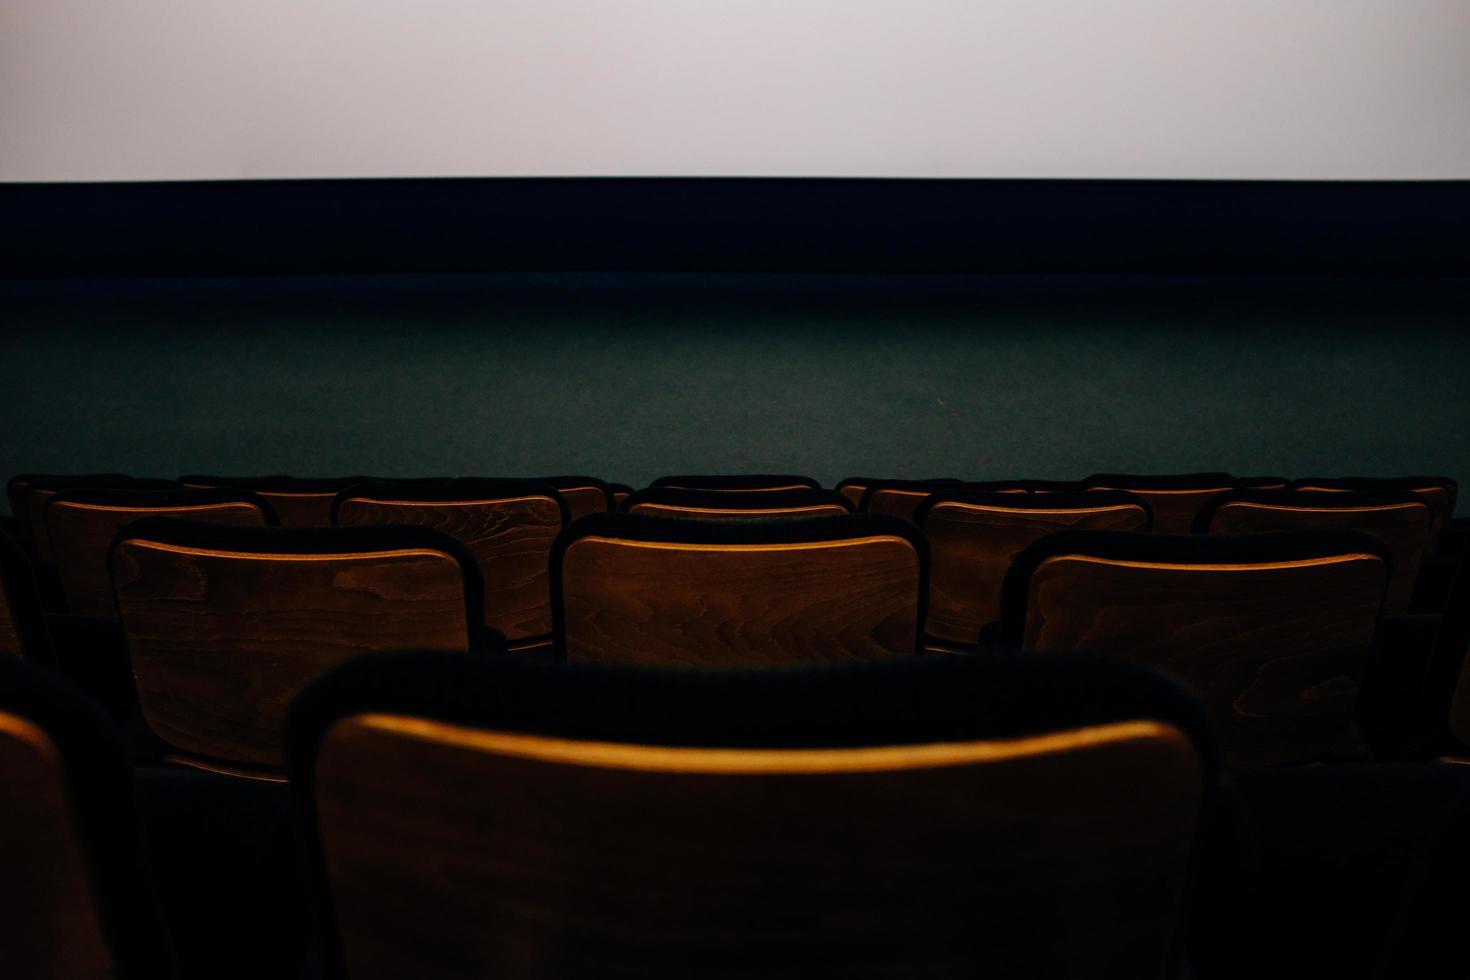 Theater seat backs photo